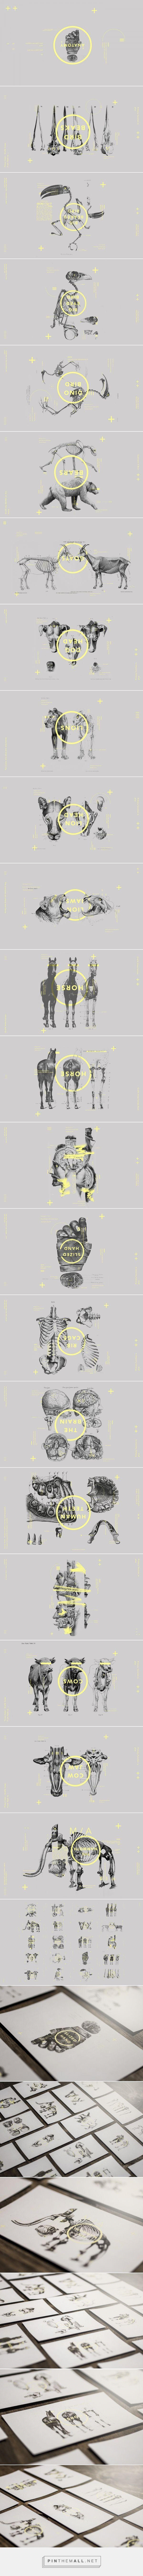 Anatomy ++ on Behance - created via https://pinthemall.net